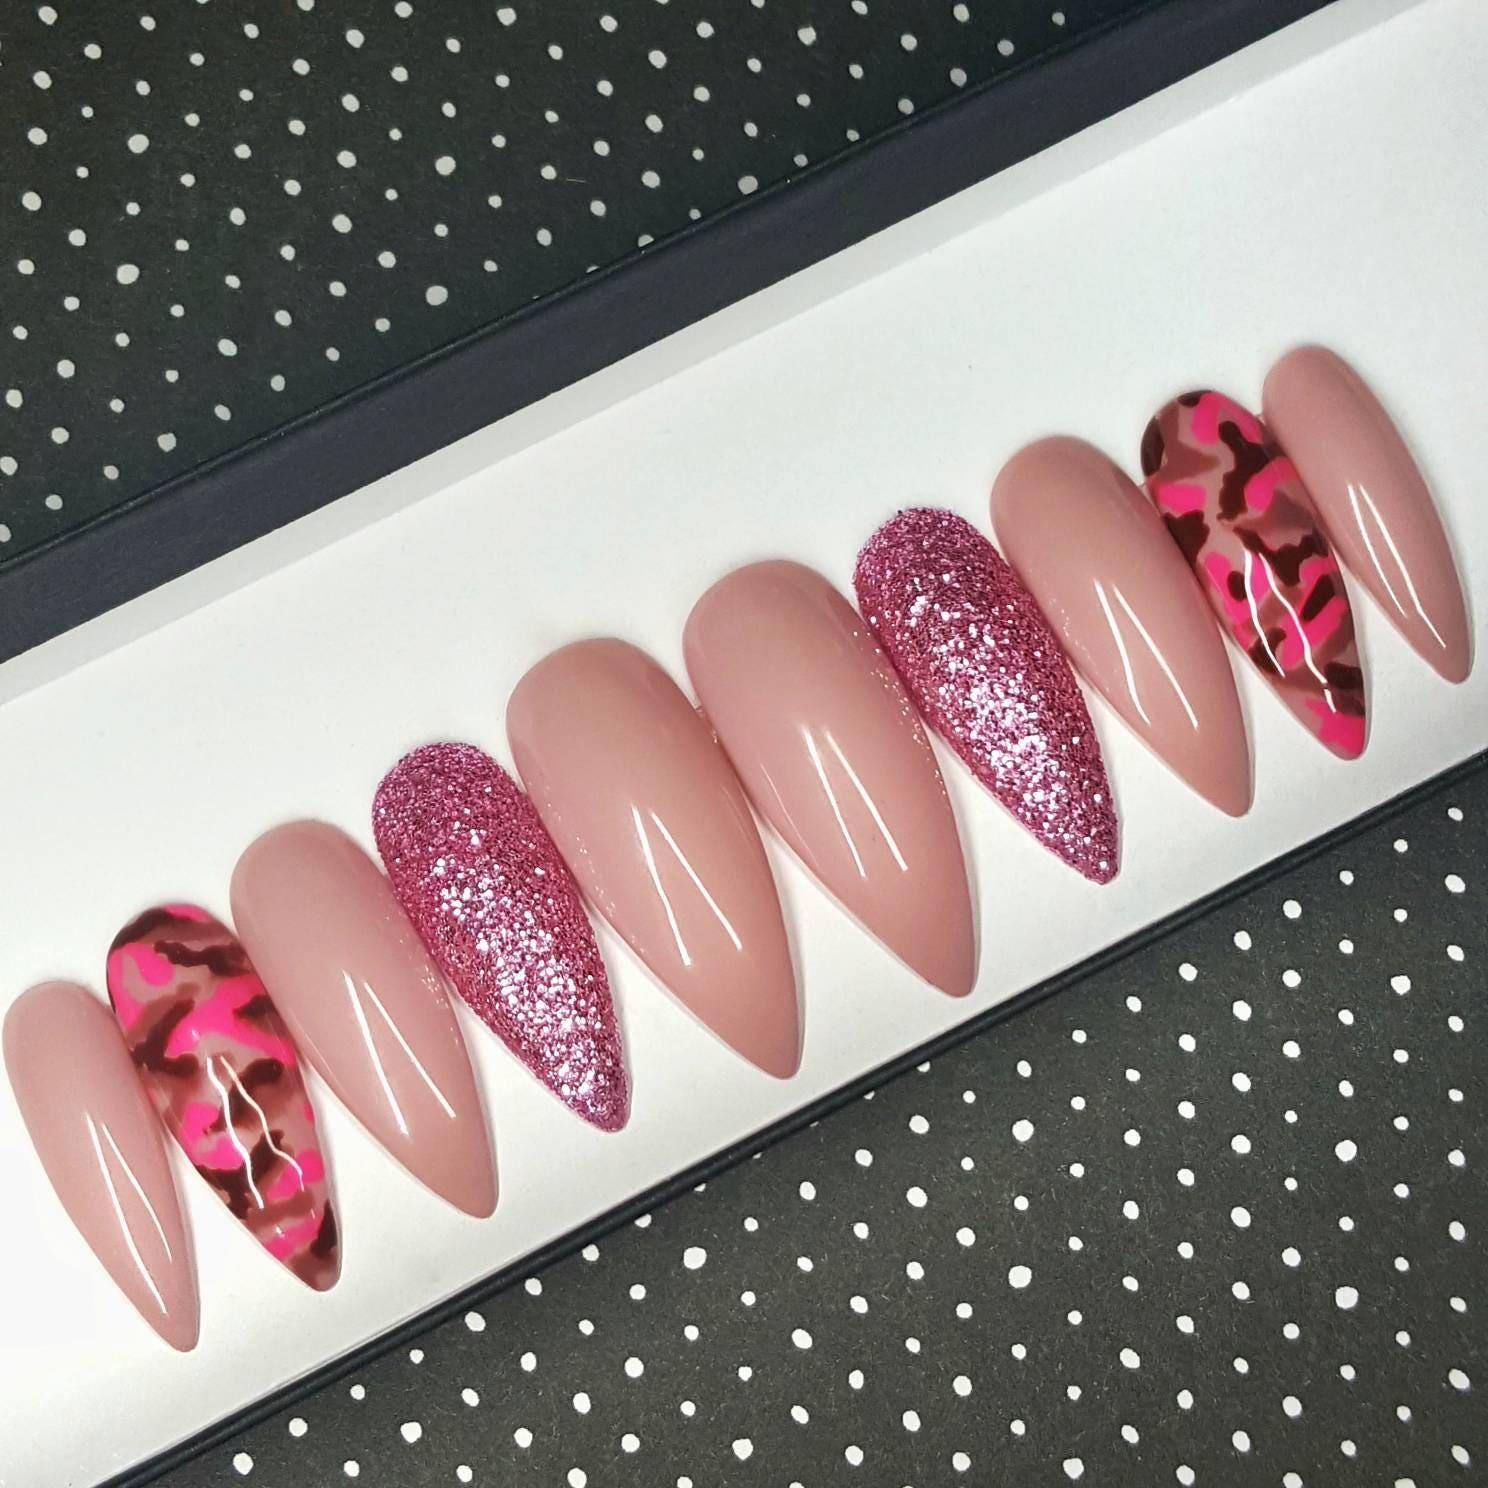 Serving Pink Press on Nails   False Nails   Stick on Nails   Fake ...